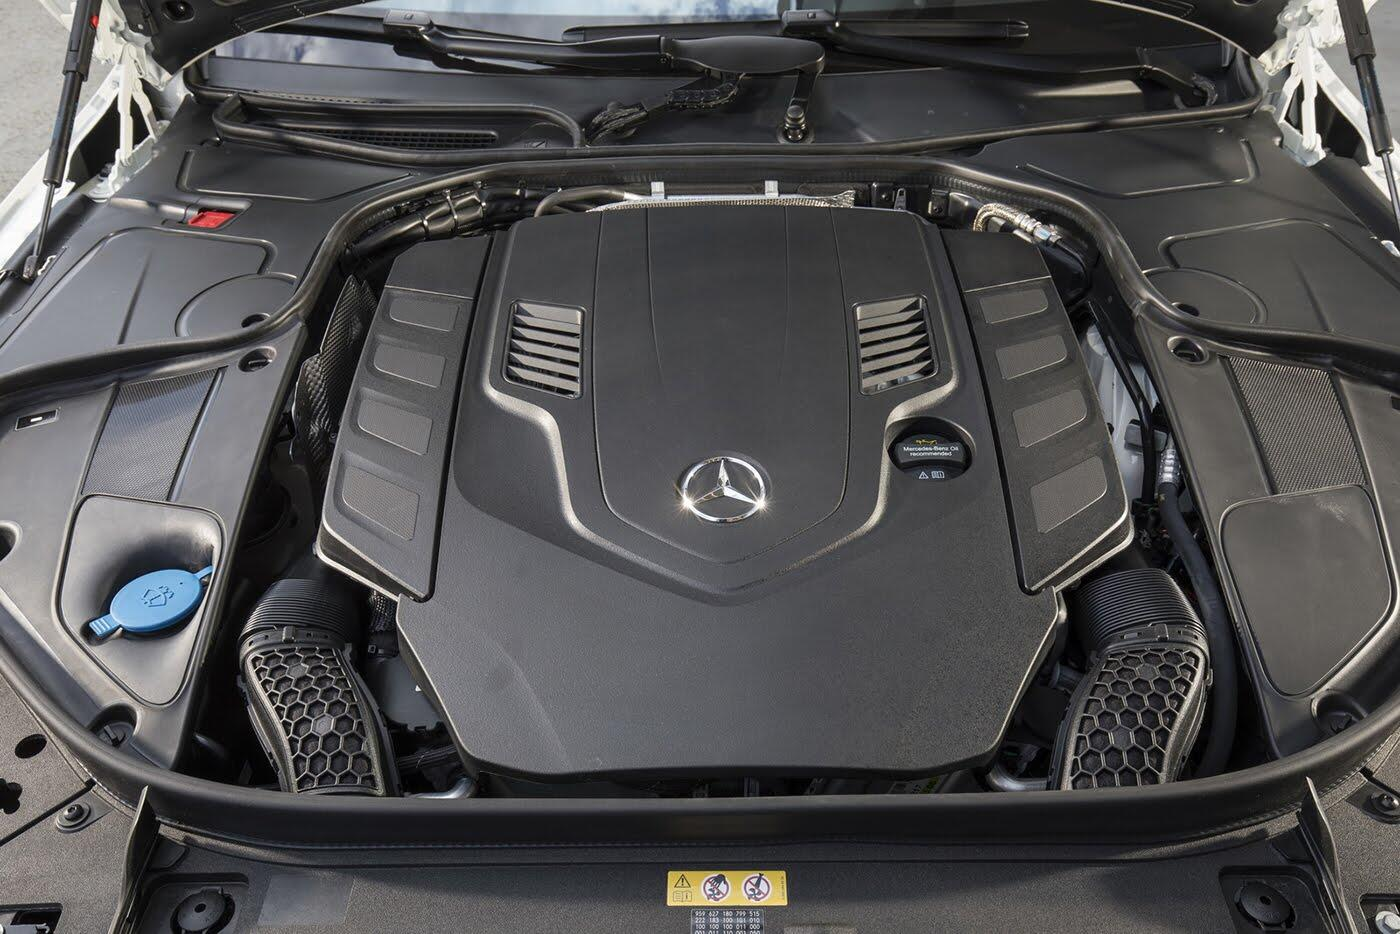 Ảnh chi tiết Mercedes-Benz S-Class 2018 - Hình 37